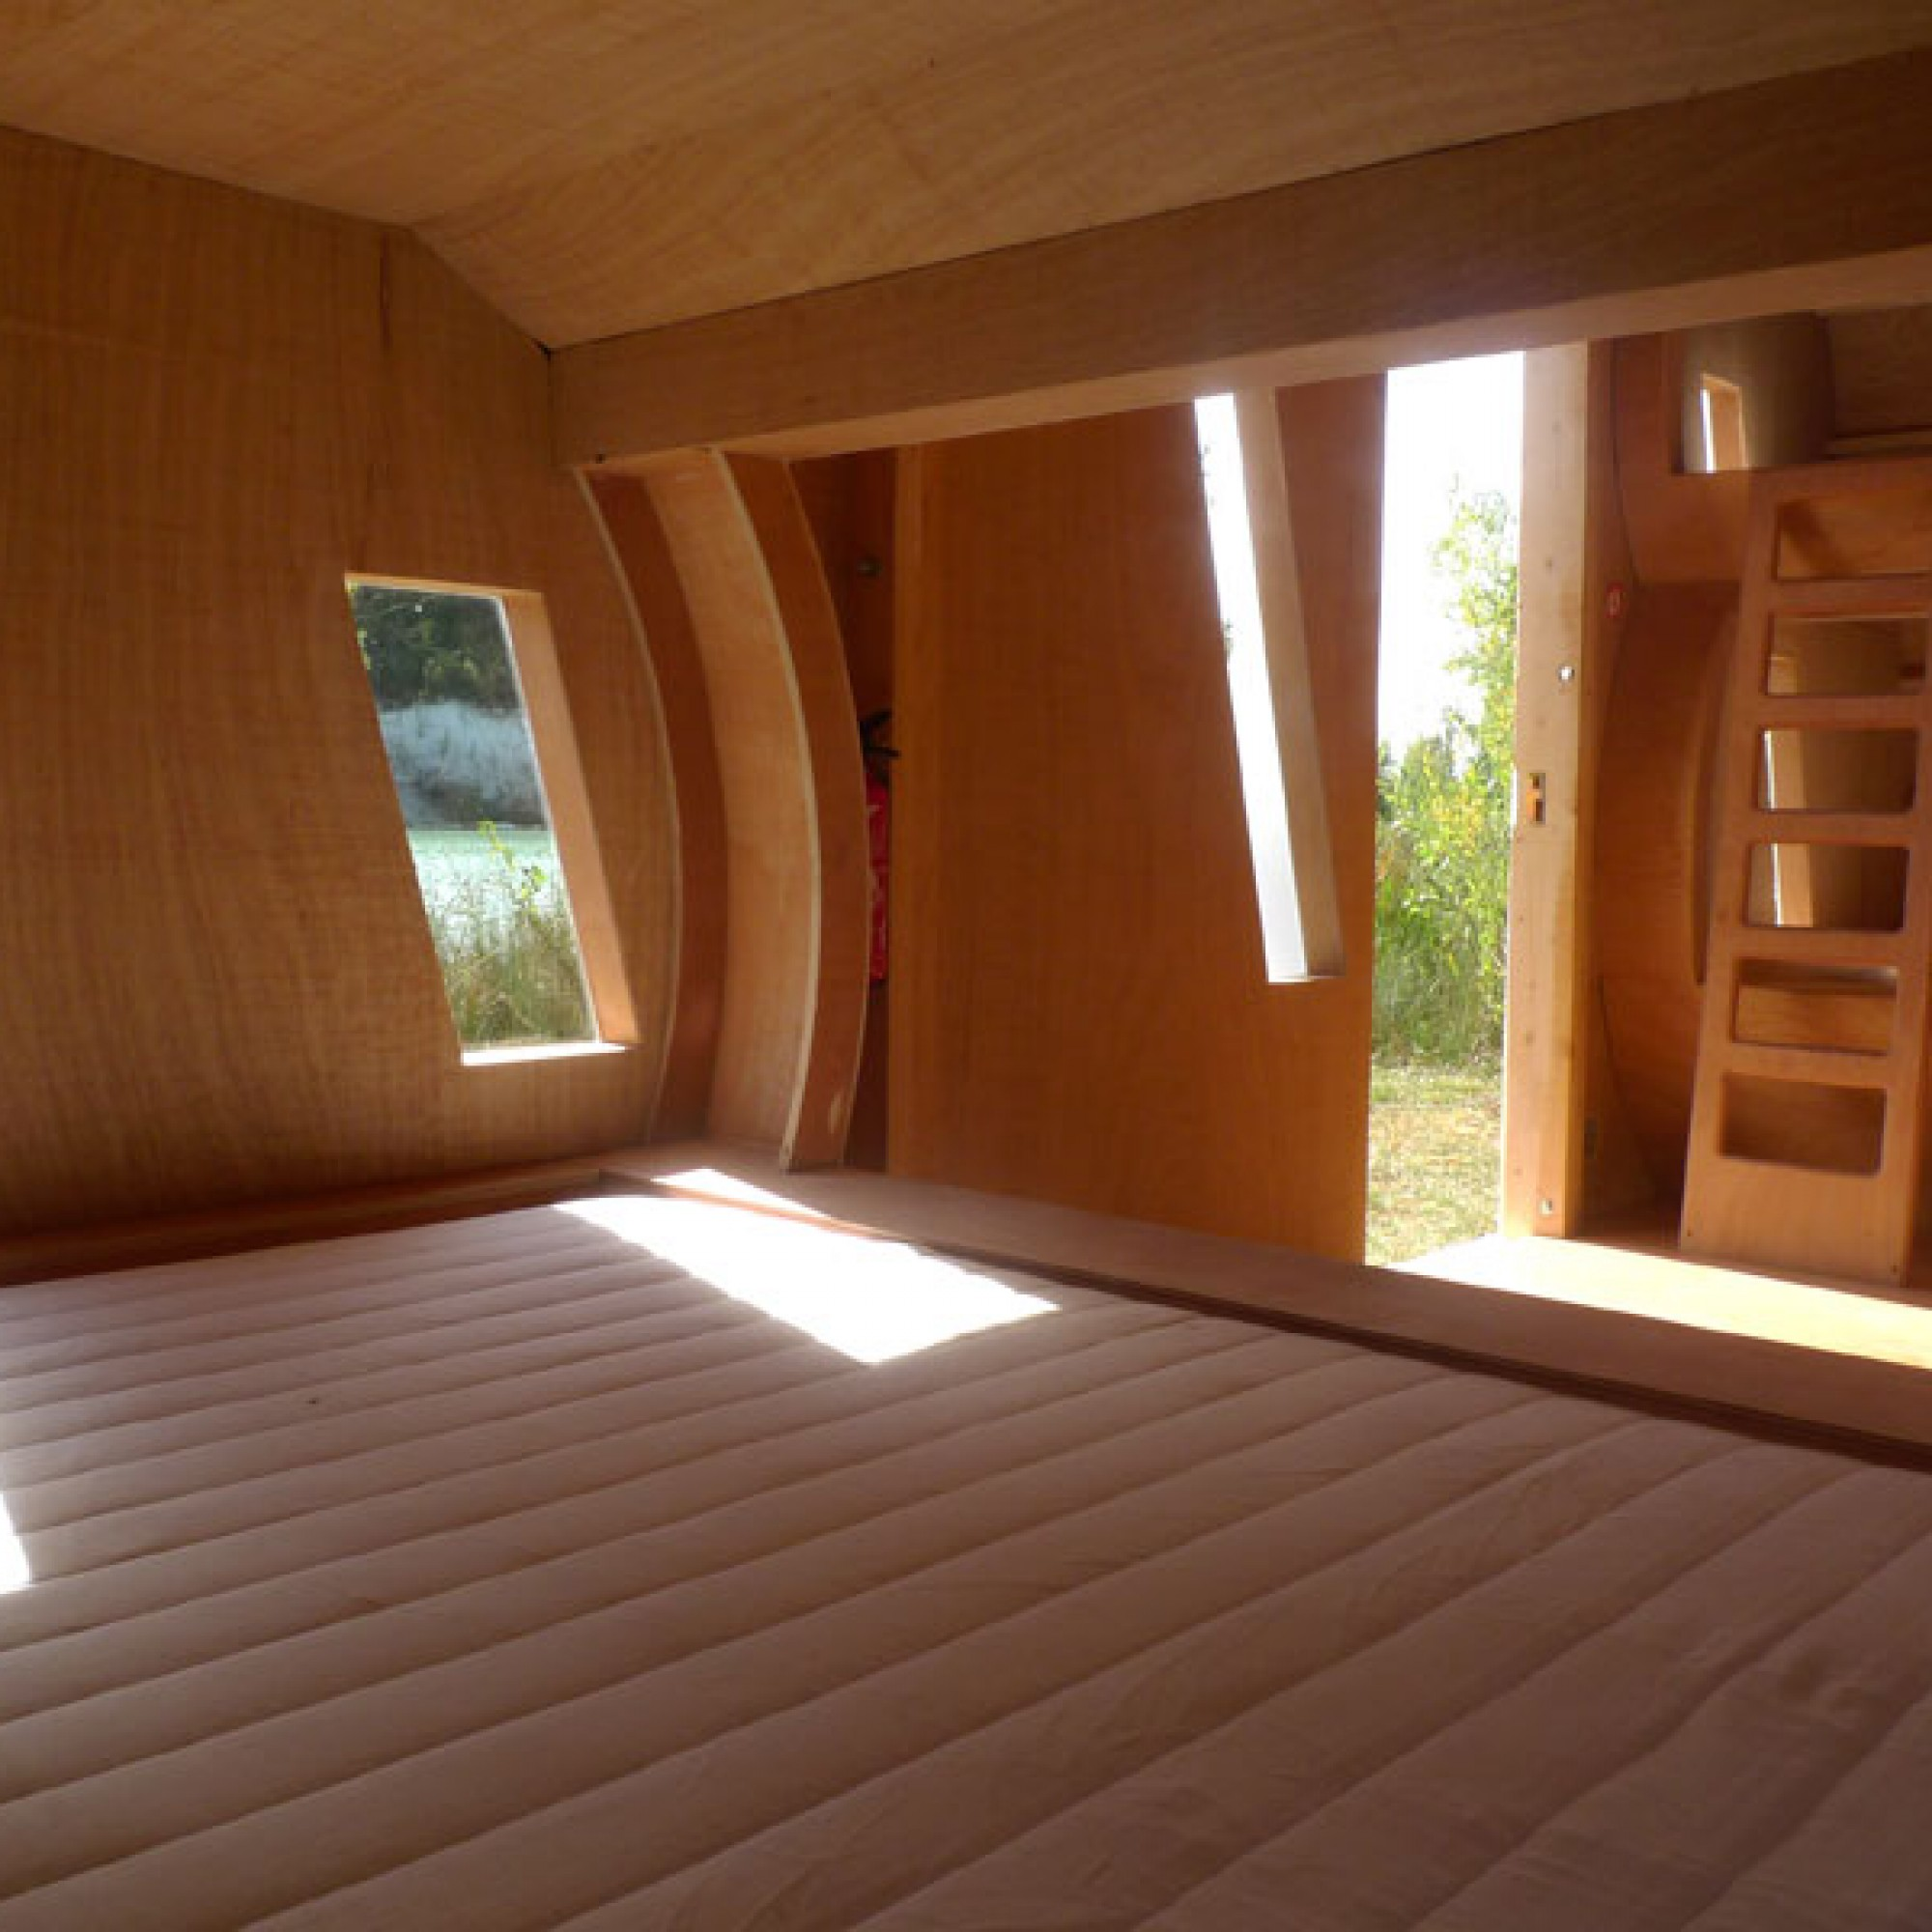 Grosse Matratzen bieten Platz für neun Leute. (Bild: Bordeaux Métropole/ Zebra3 CC BY-NC-ND 2.0)